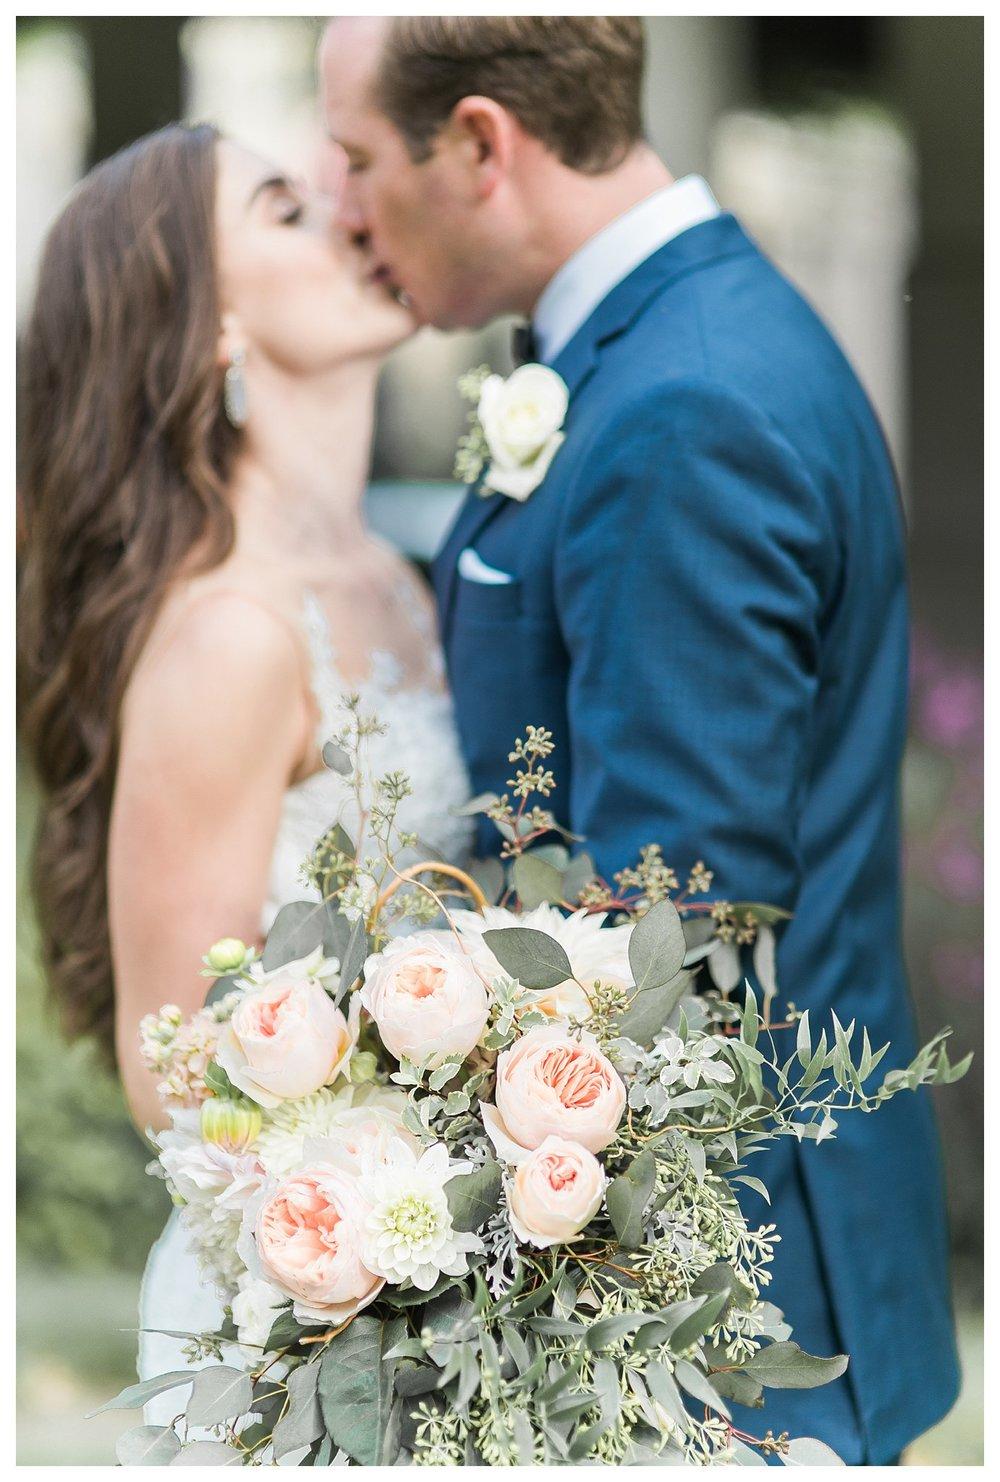 everleigh-photography-cincinnati-wedding-photographer-the-backstage-event-center-adamandlauren-46